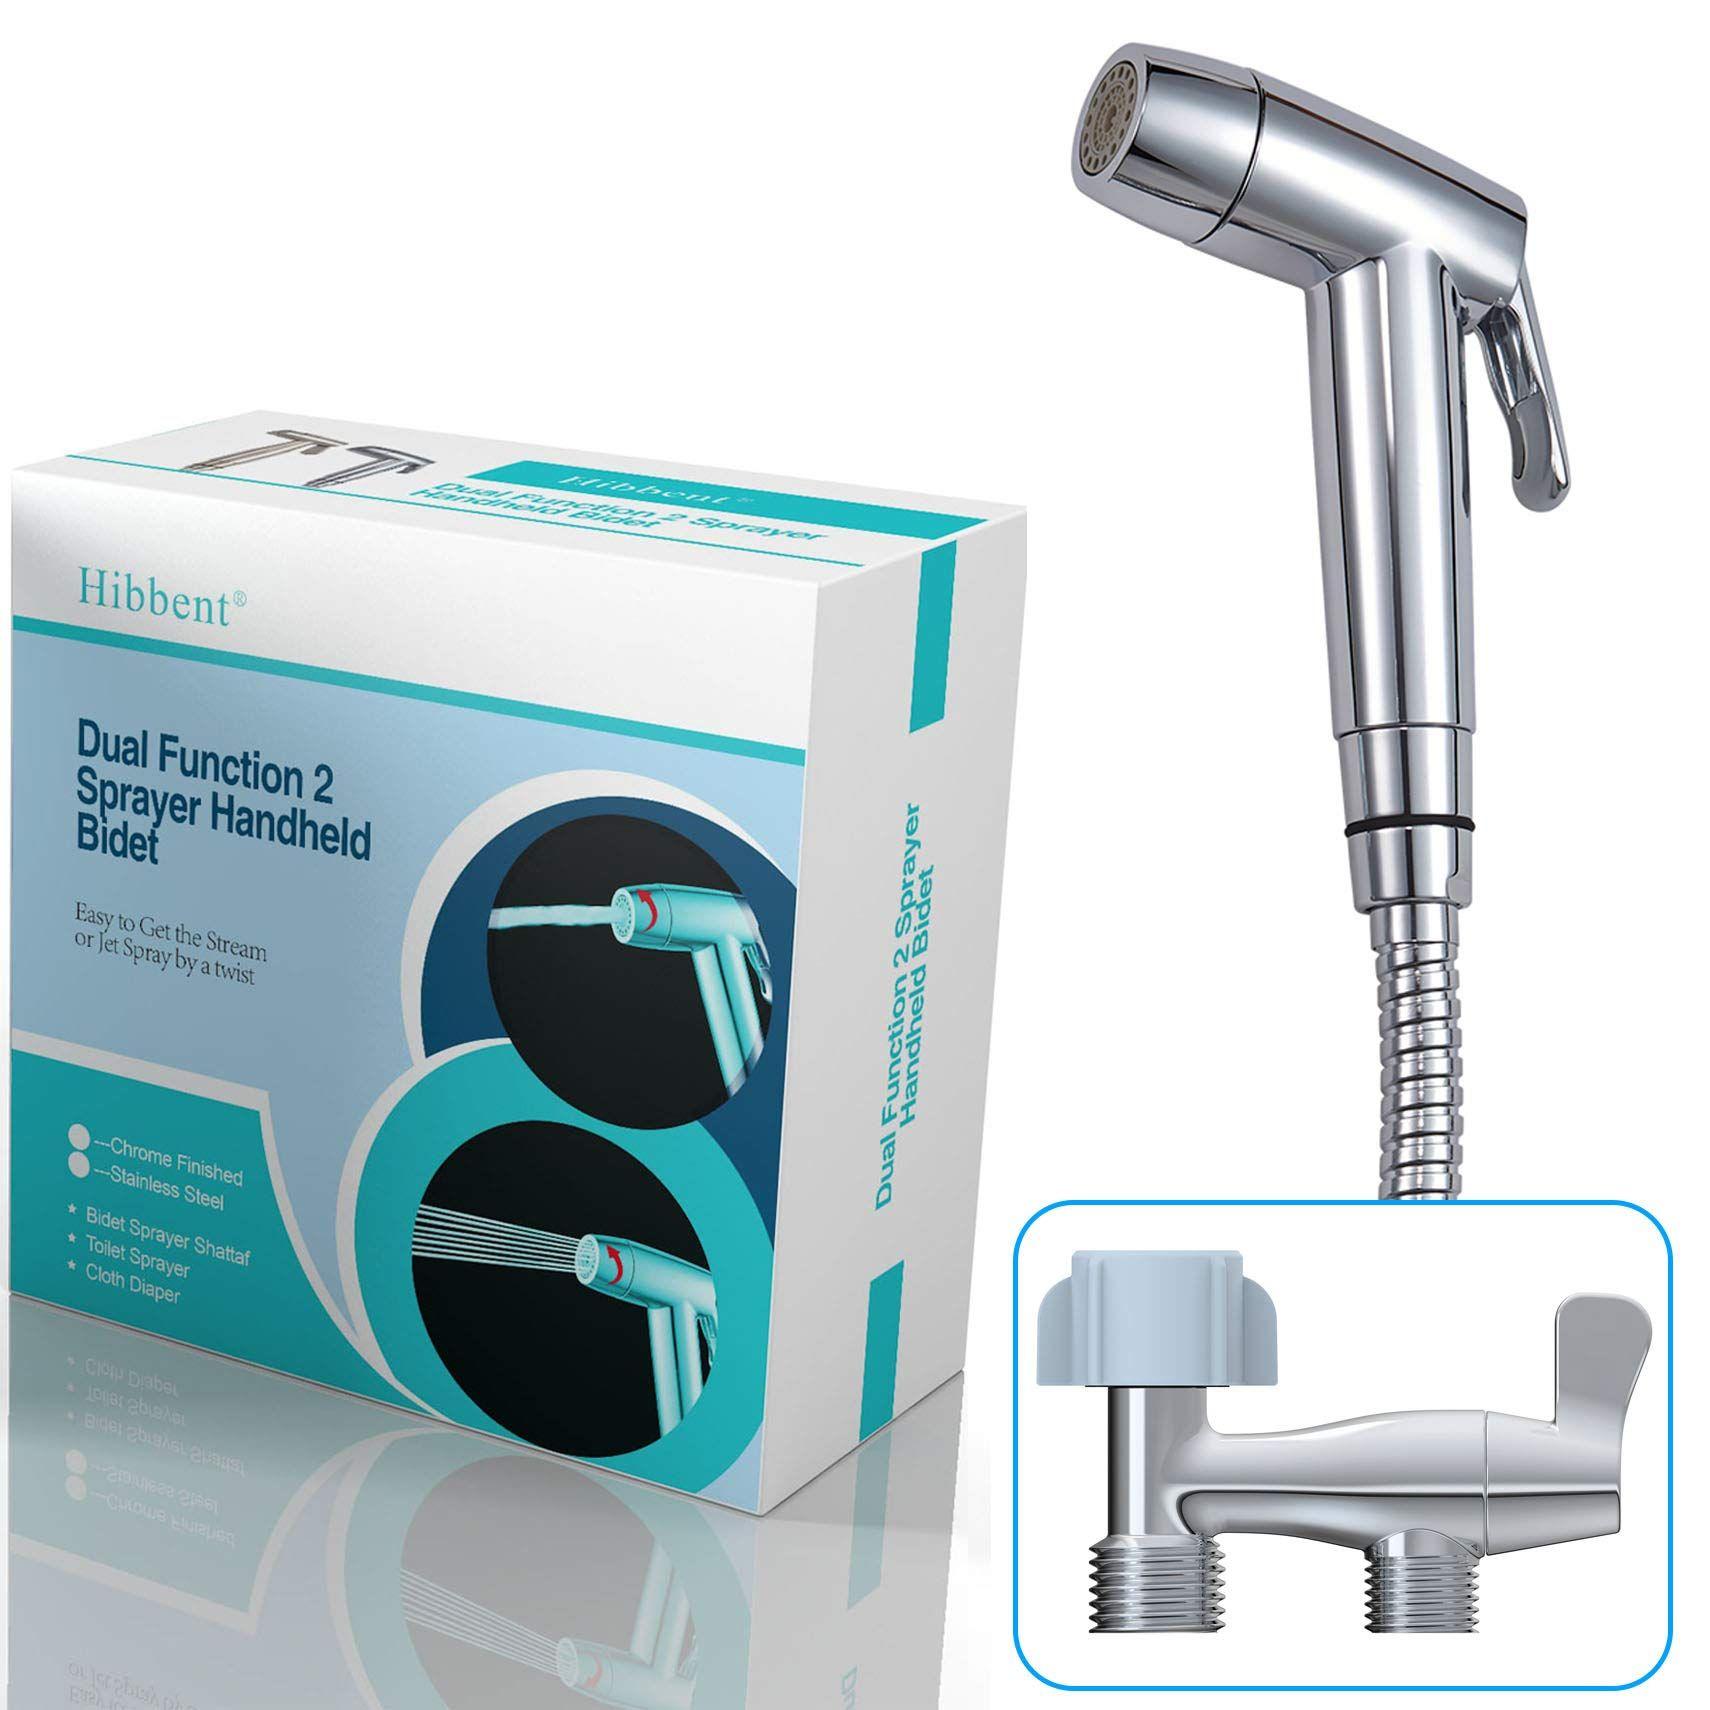 Hibbent Dual Function 2 Sprayer Stream Jet Hand Held Bidet Toilet Sprayer Shattaf Cloth Diaper Sprayer Kit Personal Hygiene Bidet Sprayer Bidet Toilet Bidet